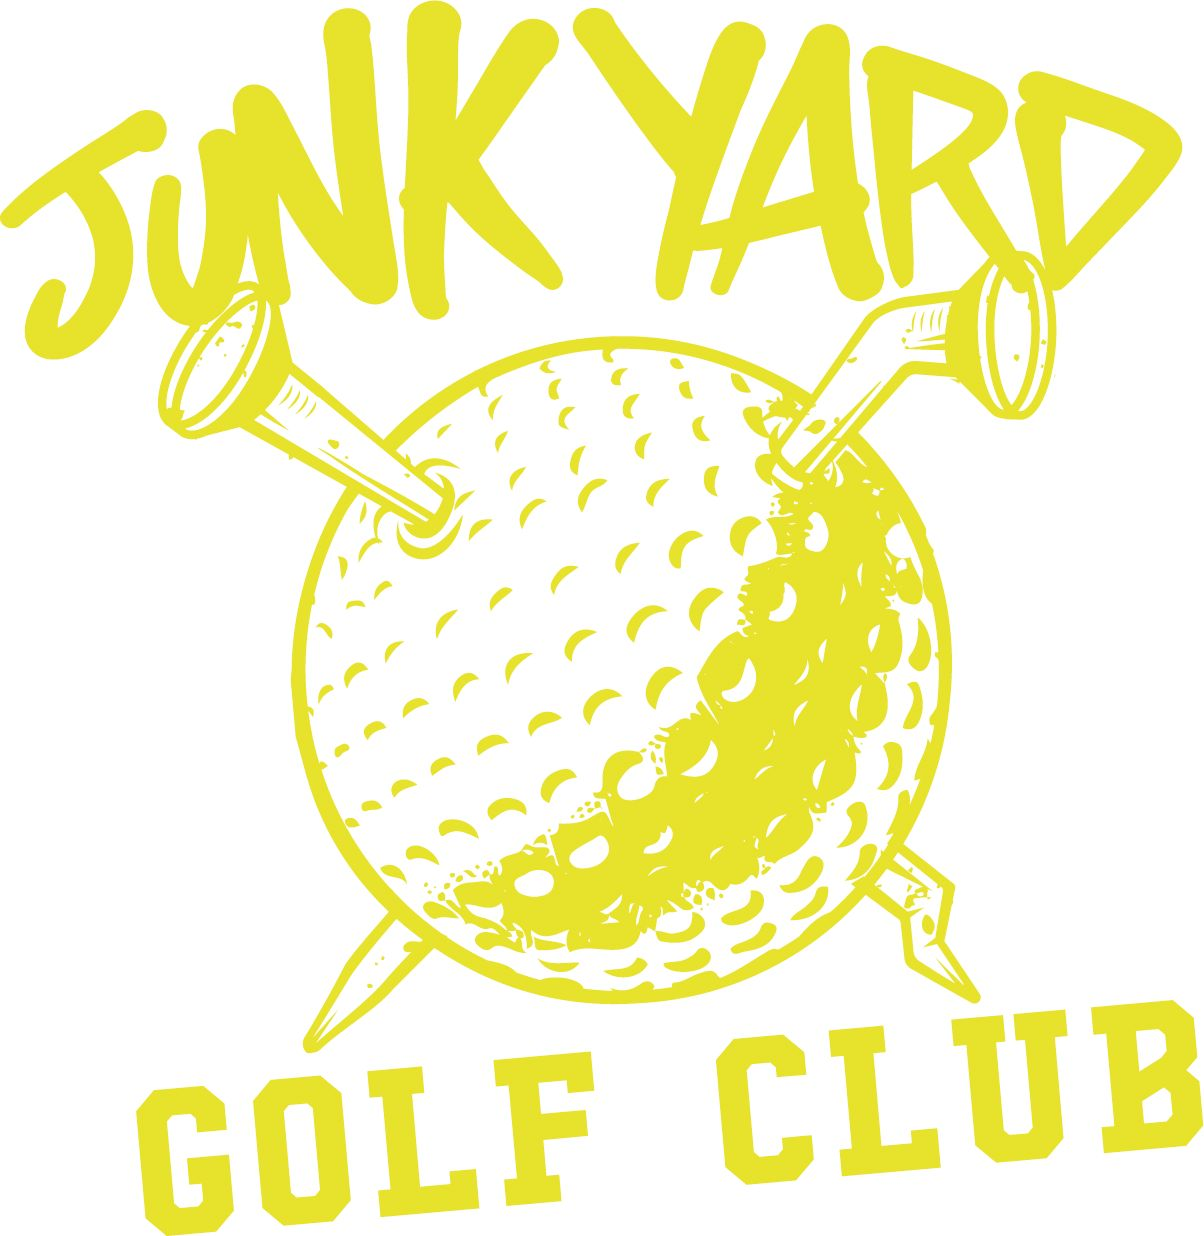 Junkyard Golf Club